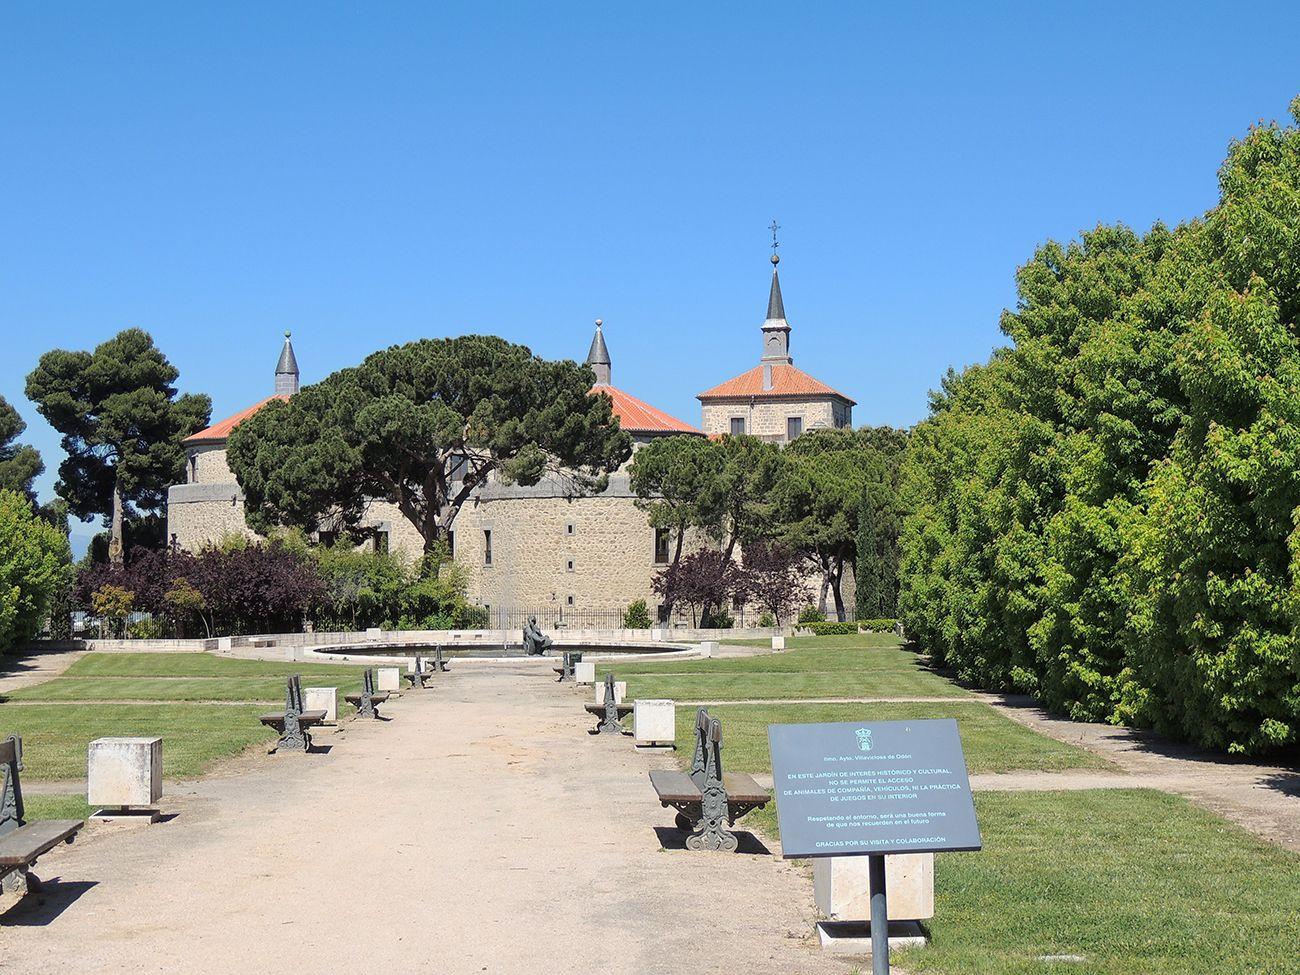 Parque en Villaviciosa de Odón. http://www.elhogarnatural.com